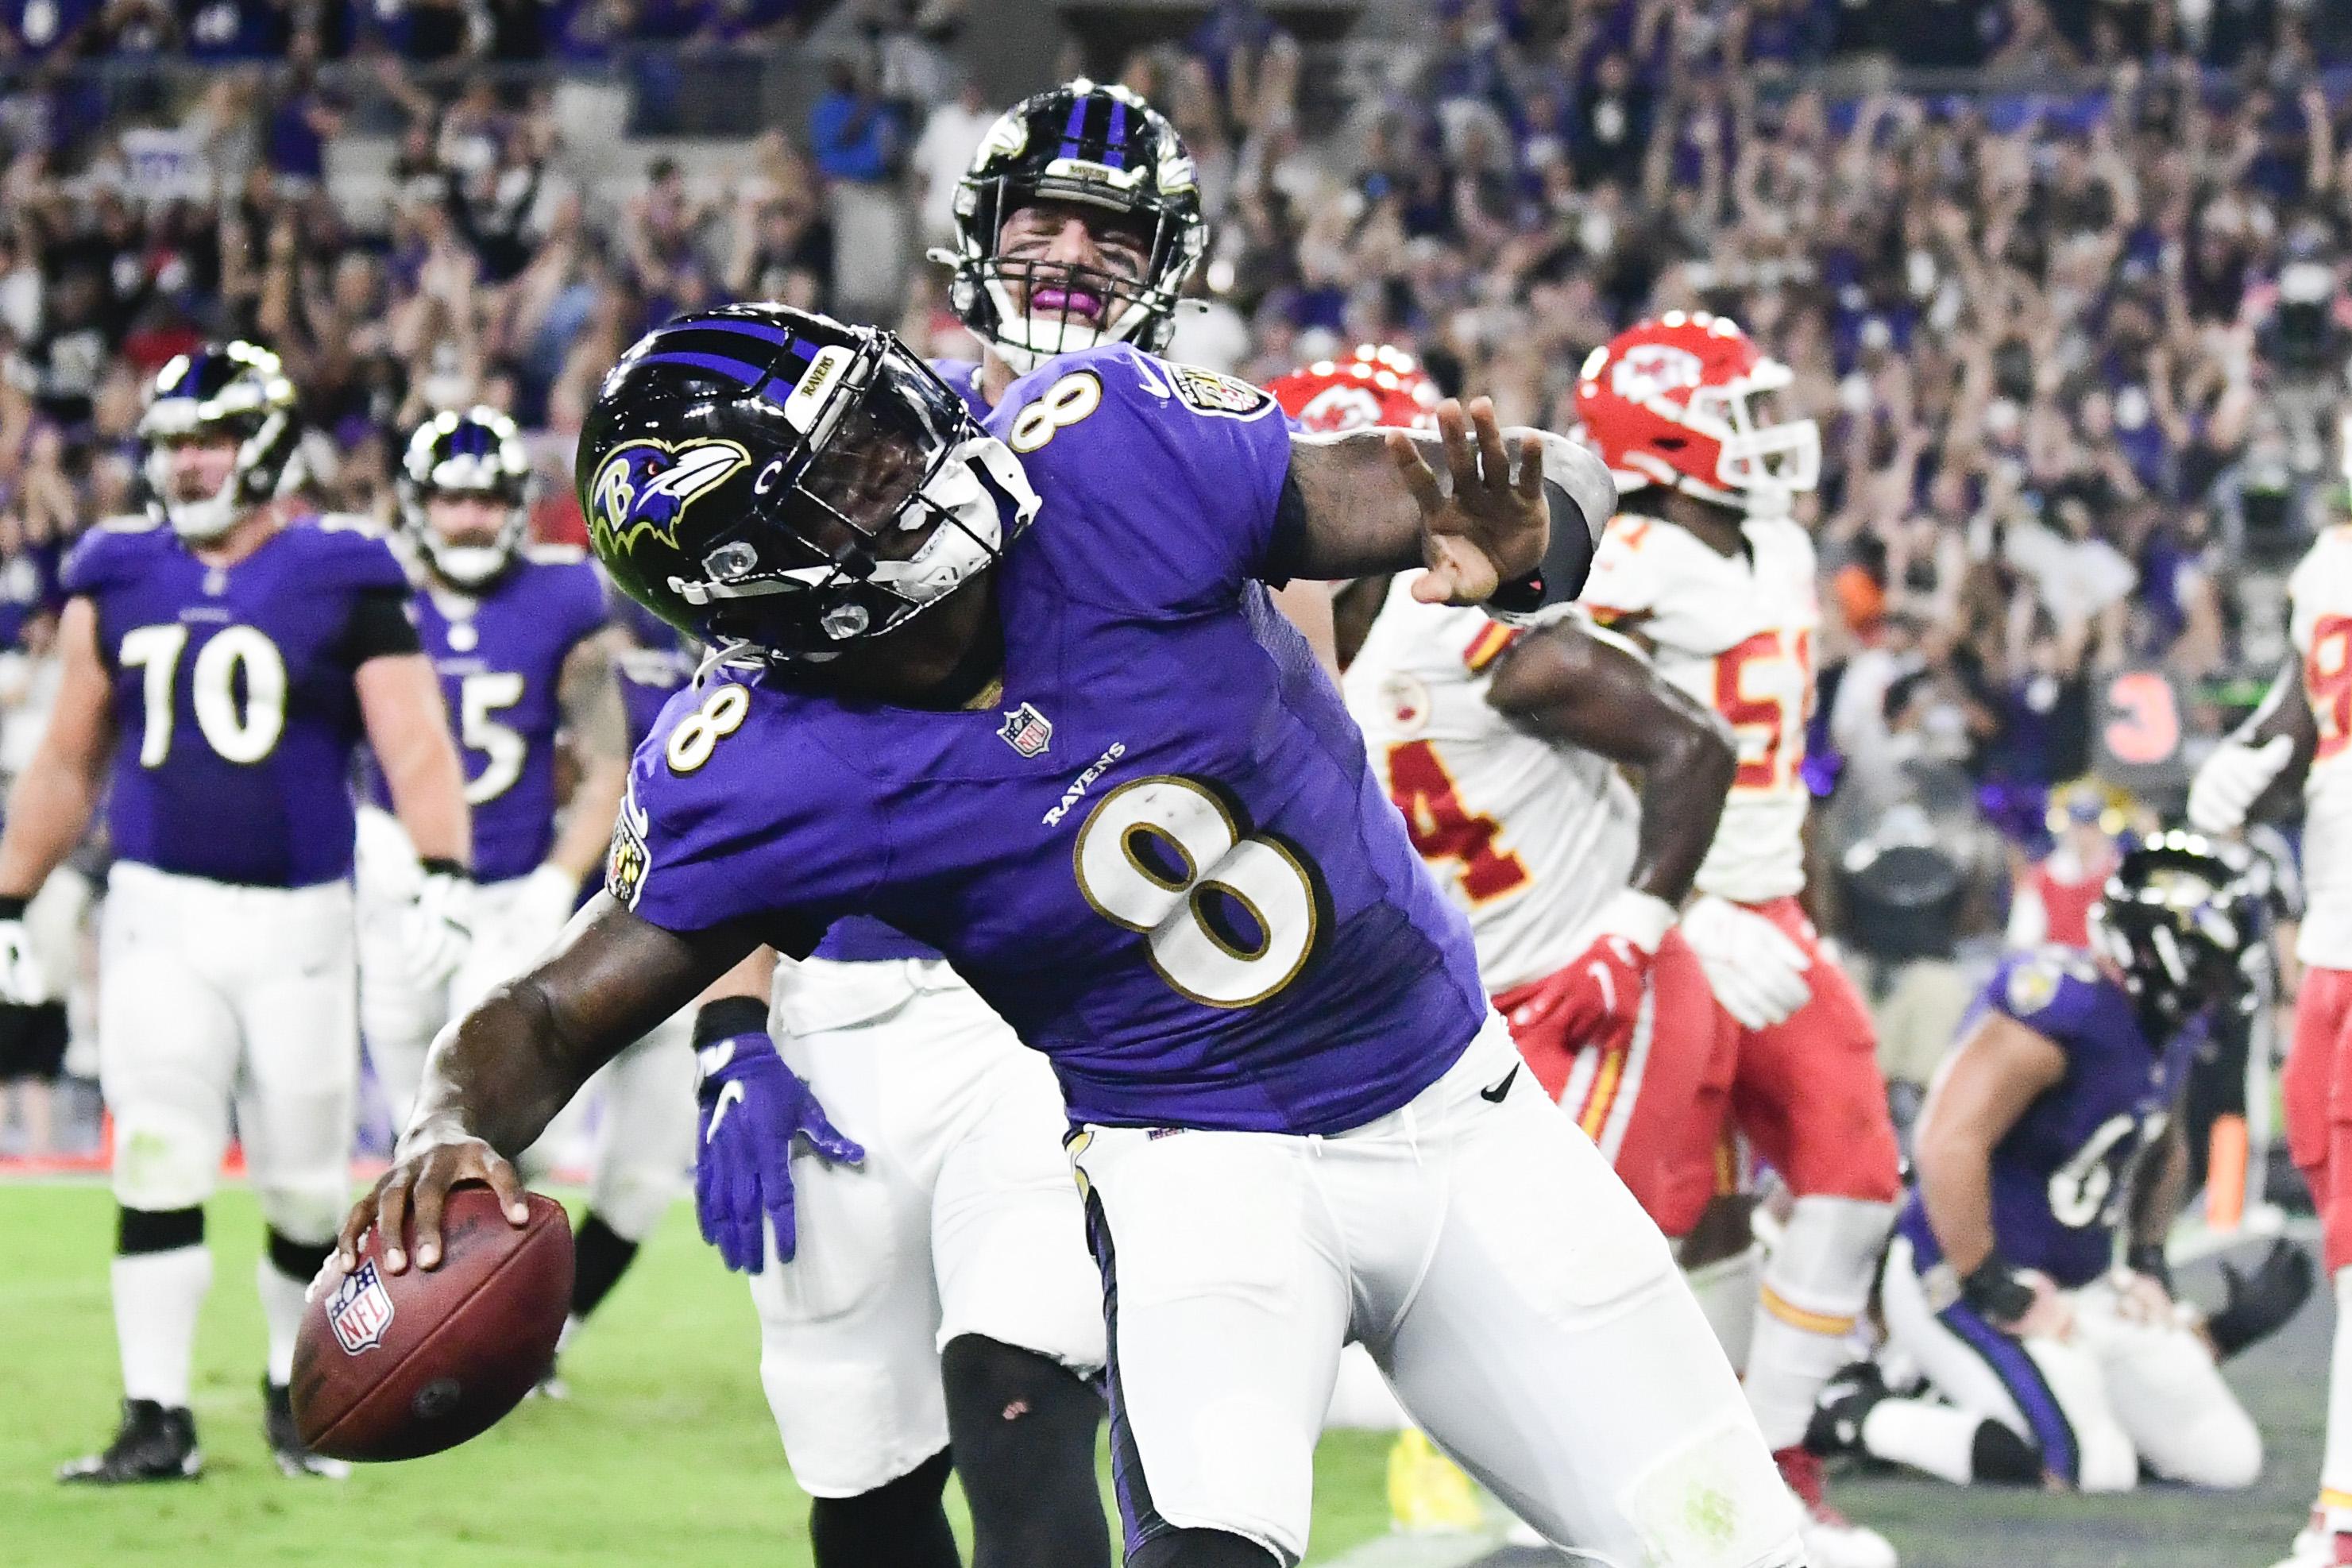 NFL: Kansas City Chiefs at Baltimore Ravens